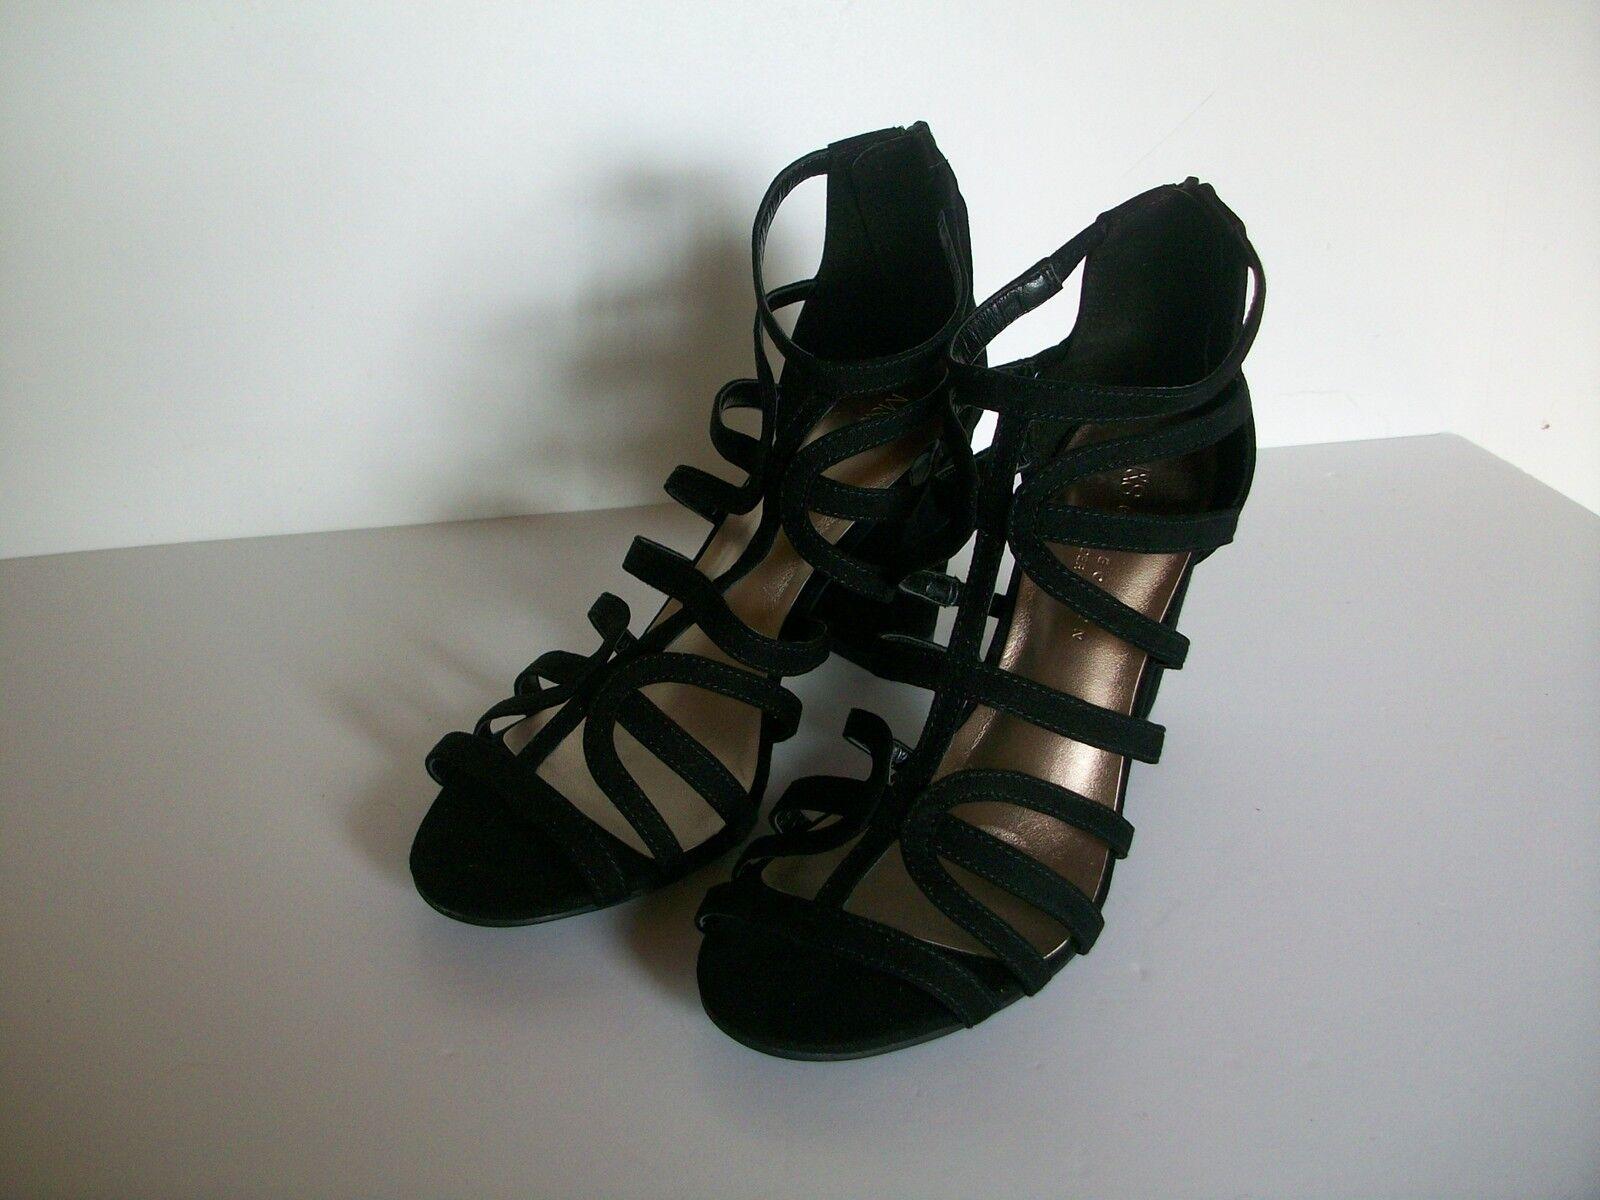 Noir en Cuir et Daim Daim Daim stappy chaussures, taille 7.5 Large Fit, Marks & Spencer, Bnwt b0b66b